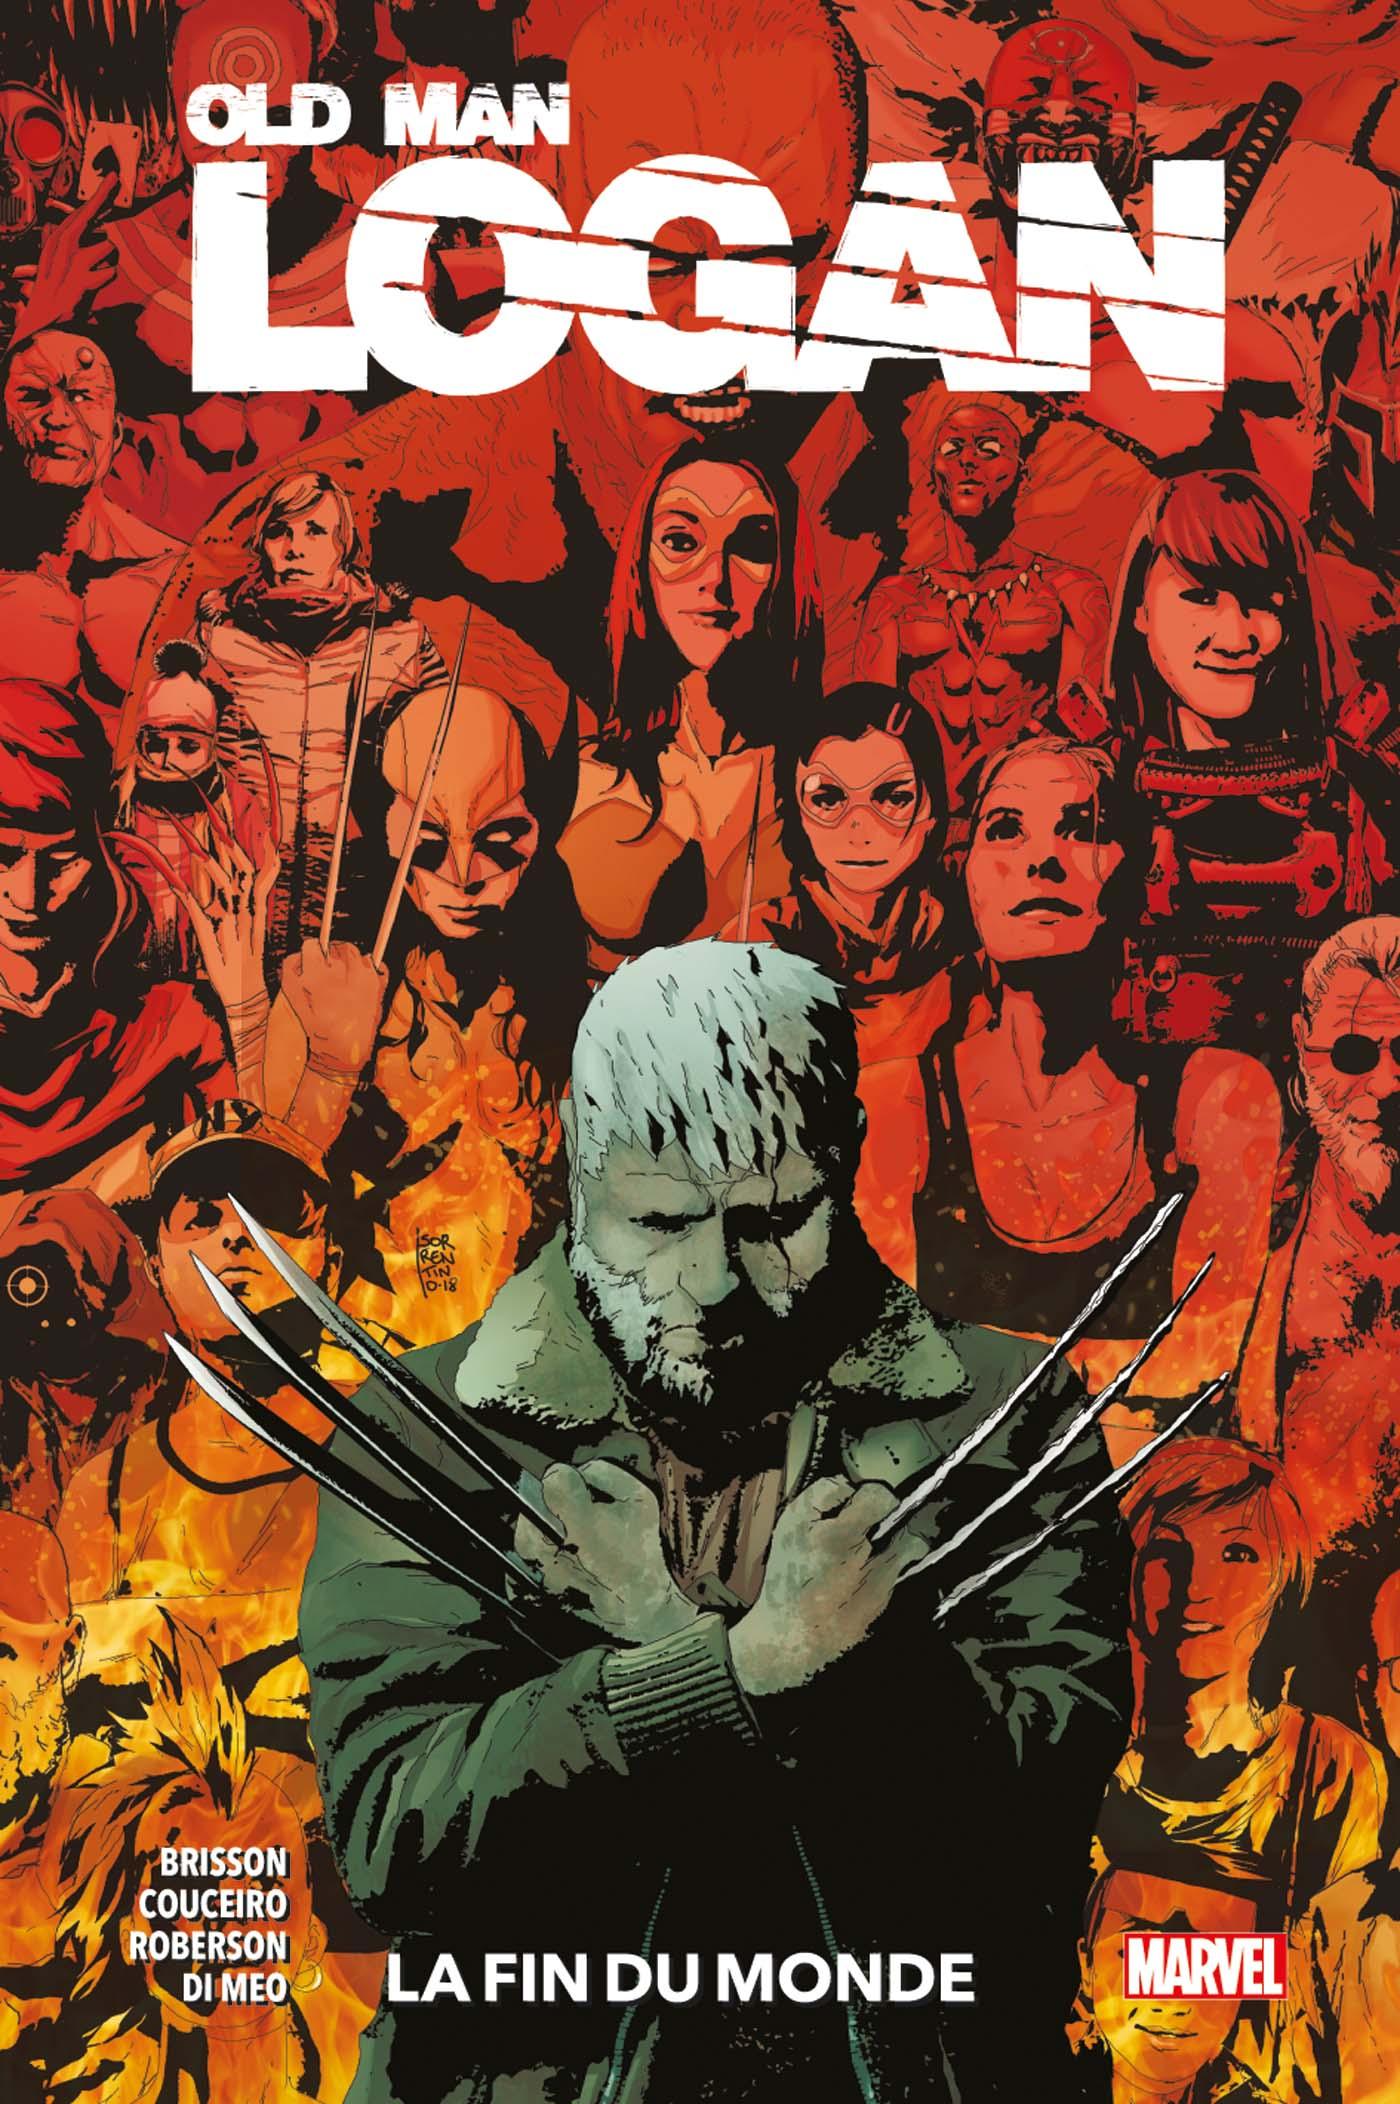 Old Man Logan 3 - La fin du monde